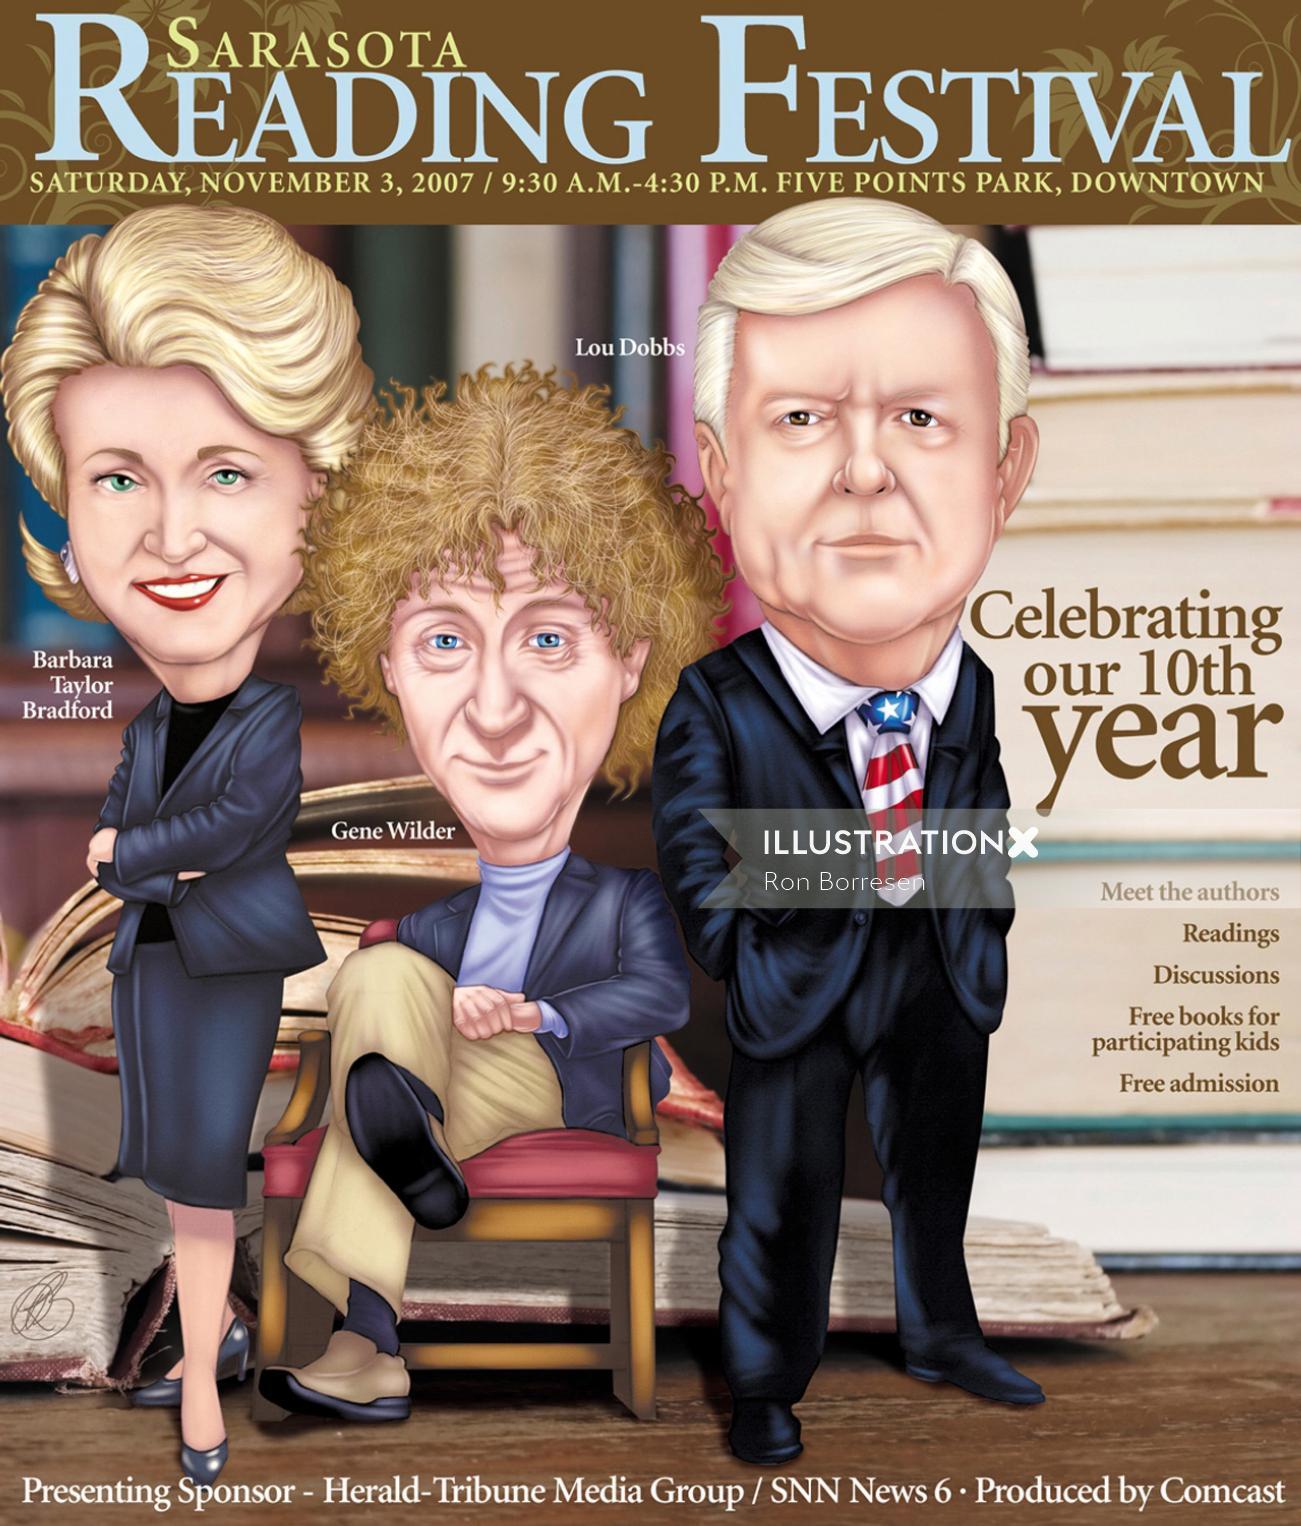 editorial of Barbara Bradford, Gene Wilder, and Lou Dobbs